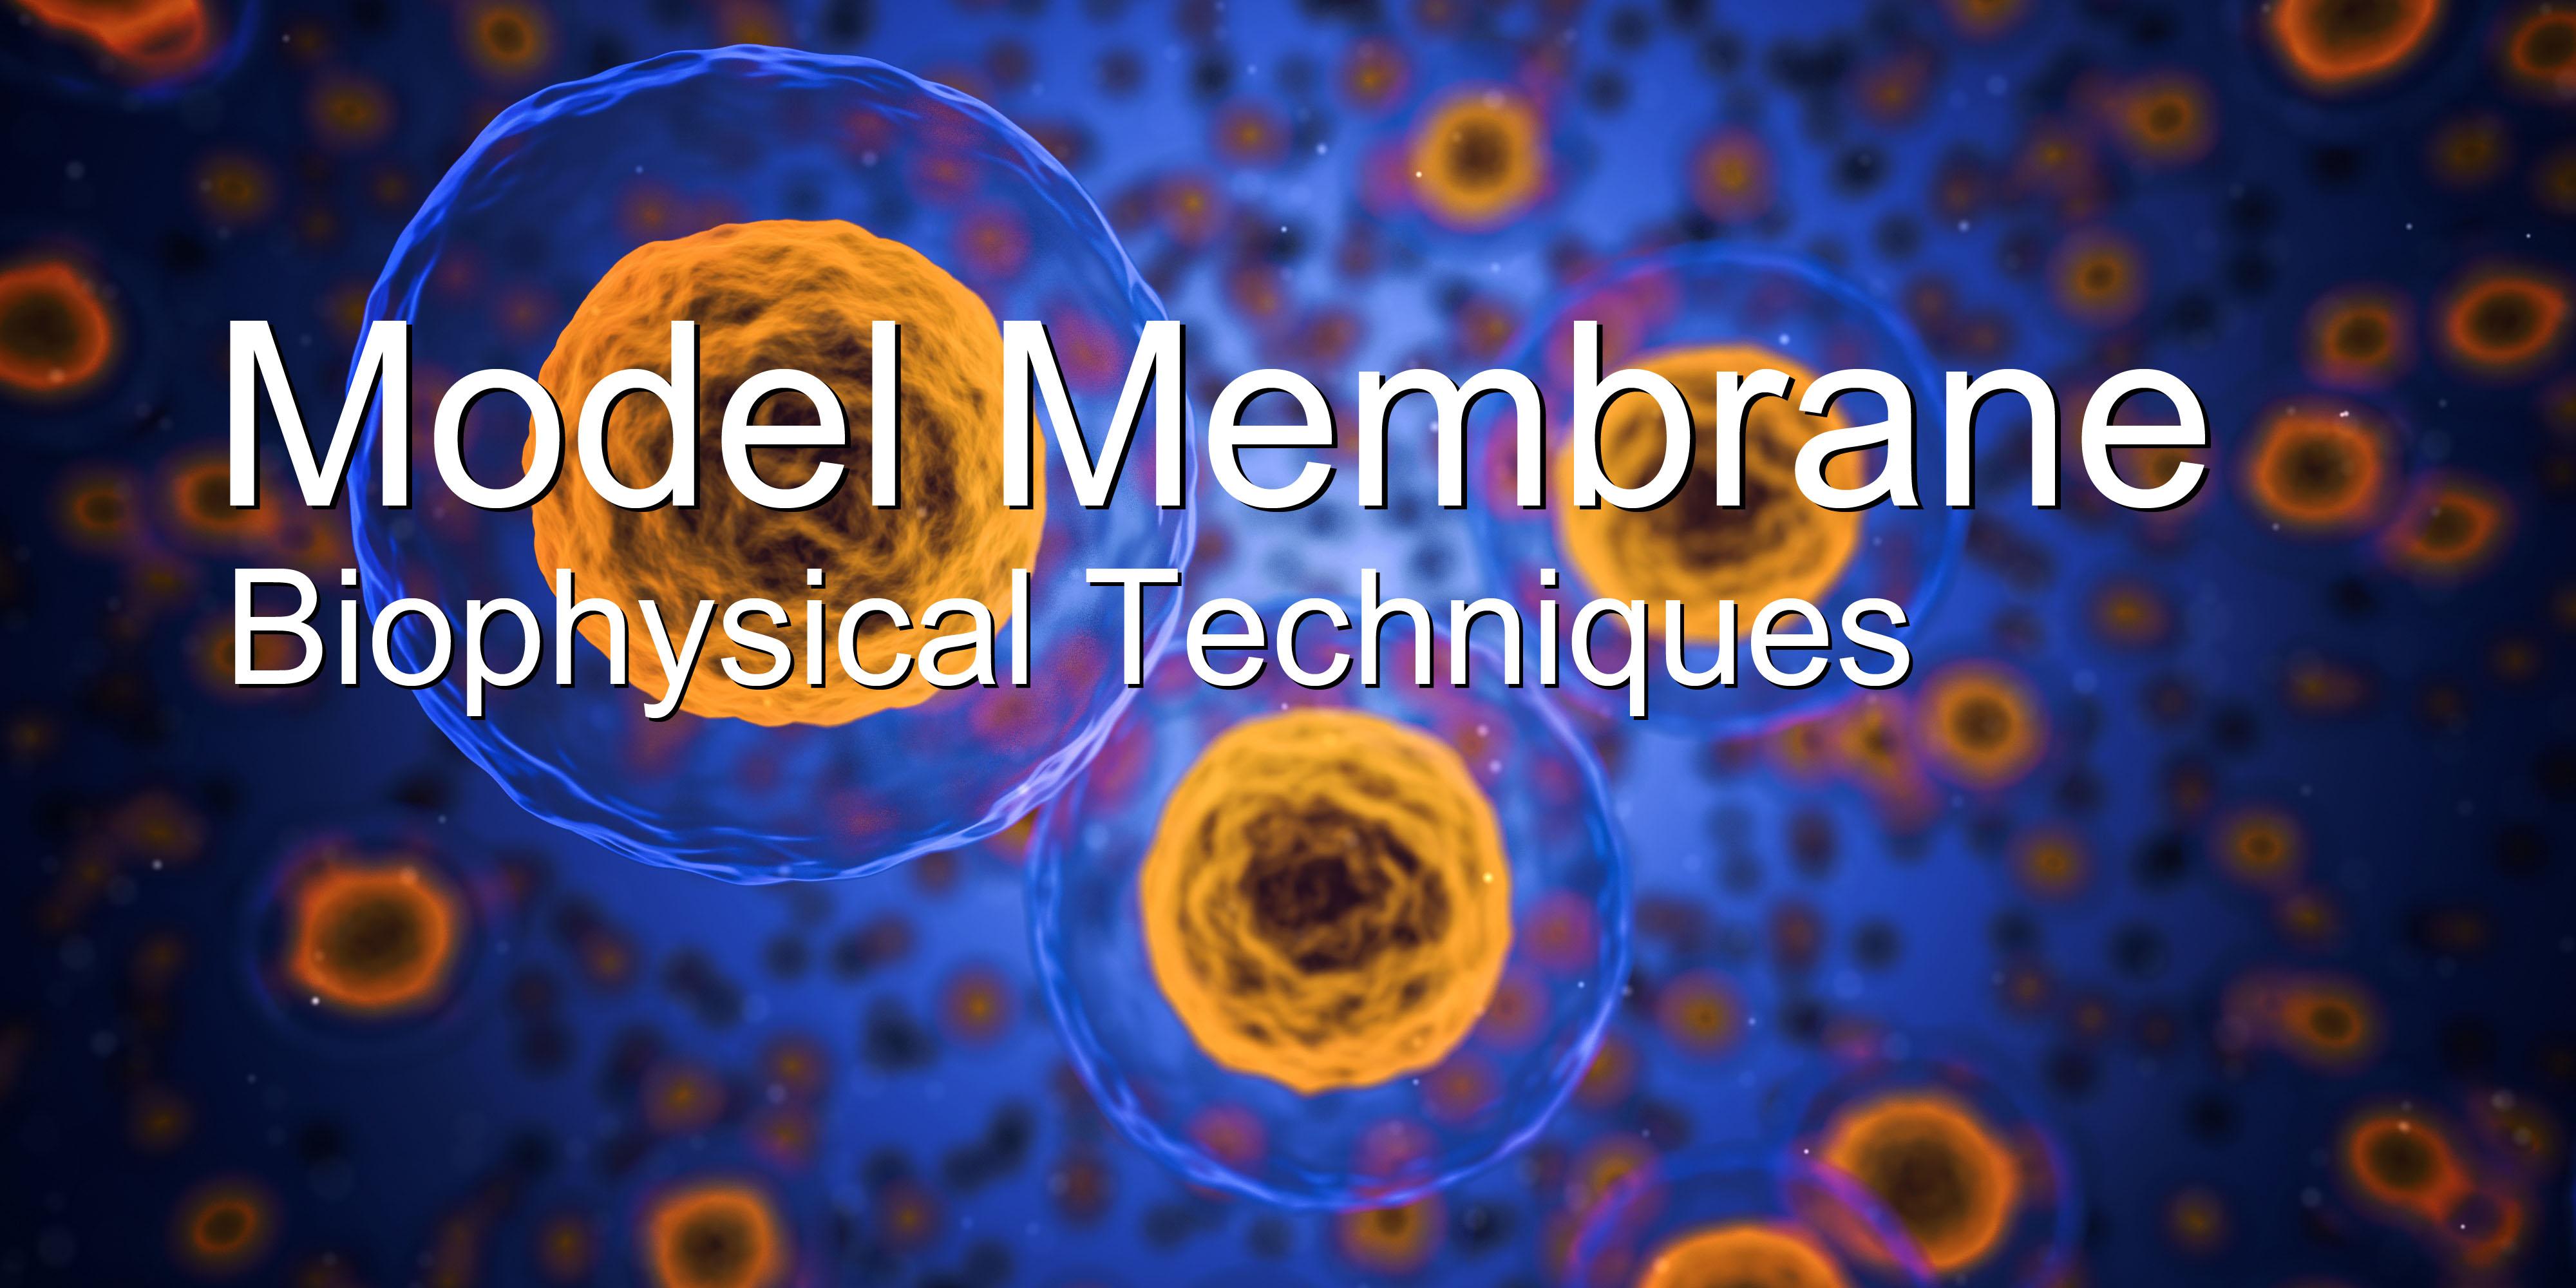 Model Membranes